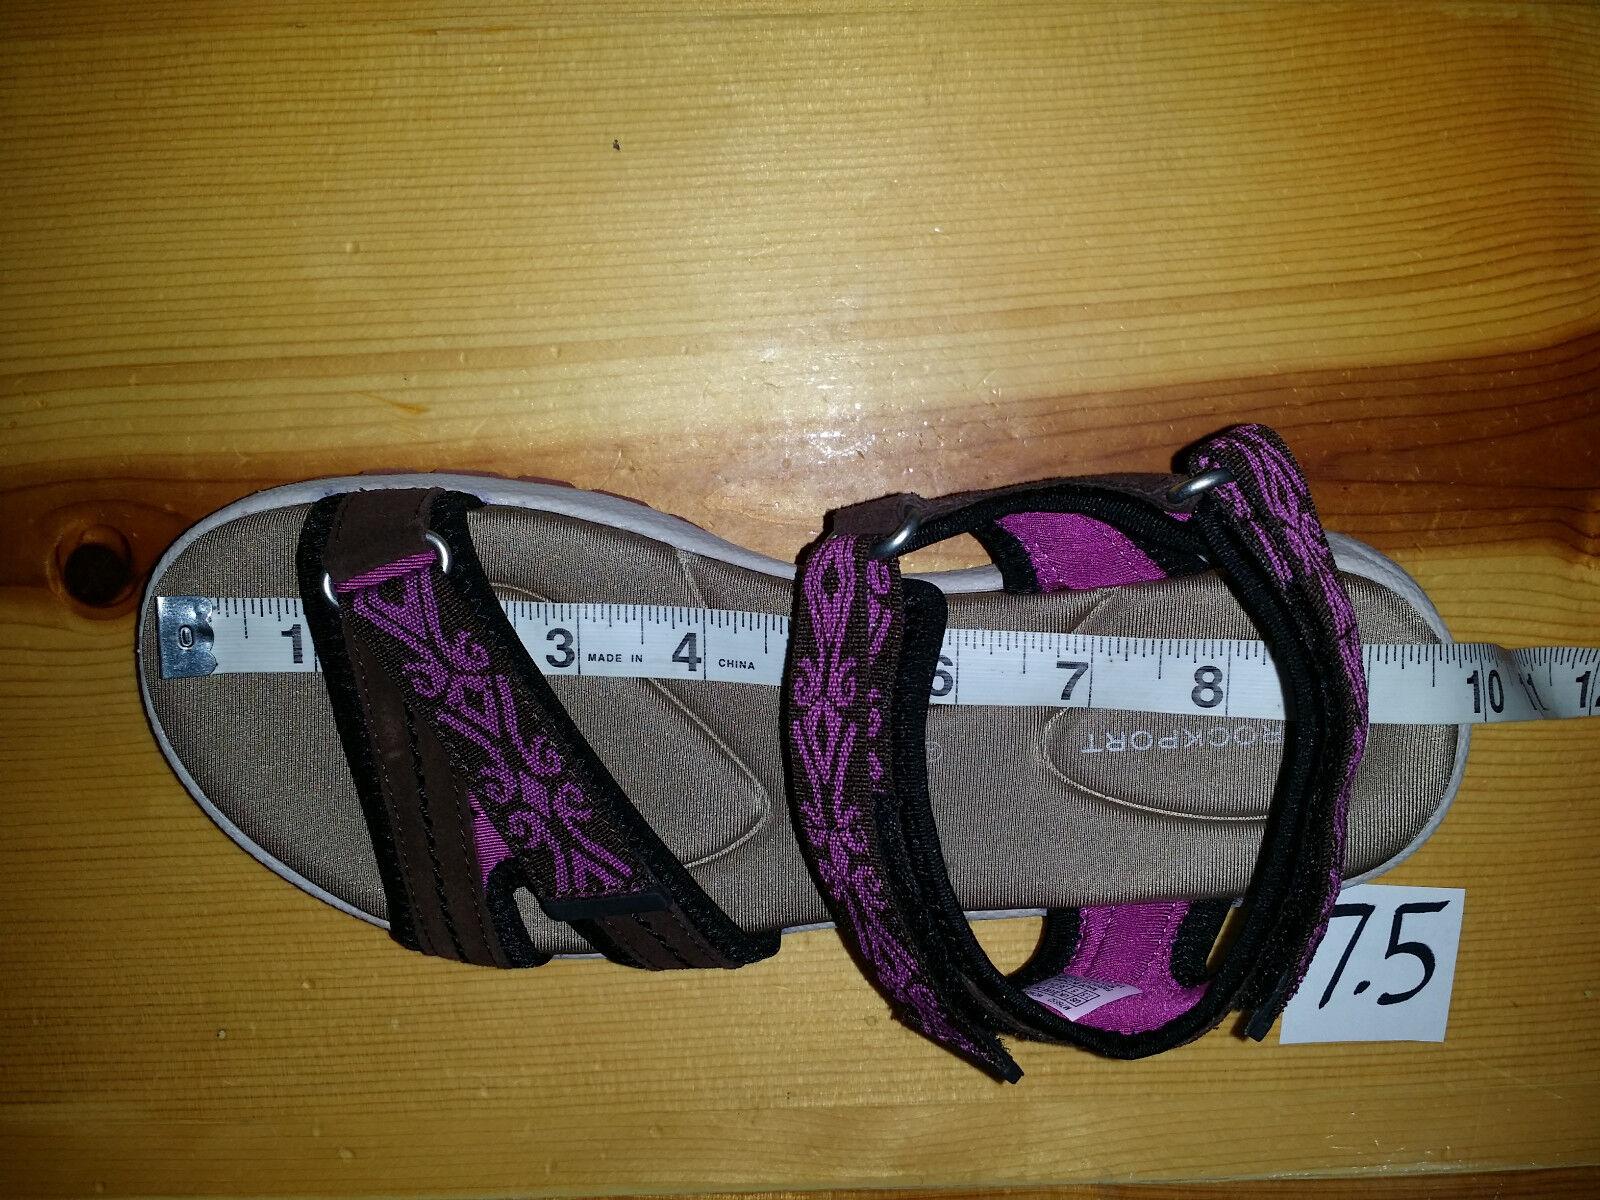 80 Donna 7.5 Rockport XCS RSLS Web Strap Qtr Strap Web Sandal ADIPRENE Technology Pink B ece2fc